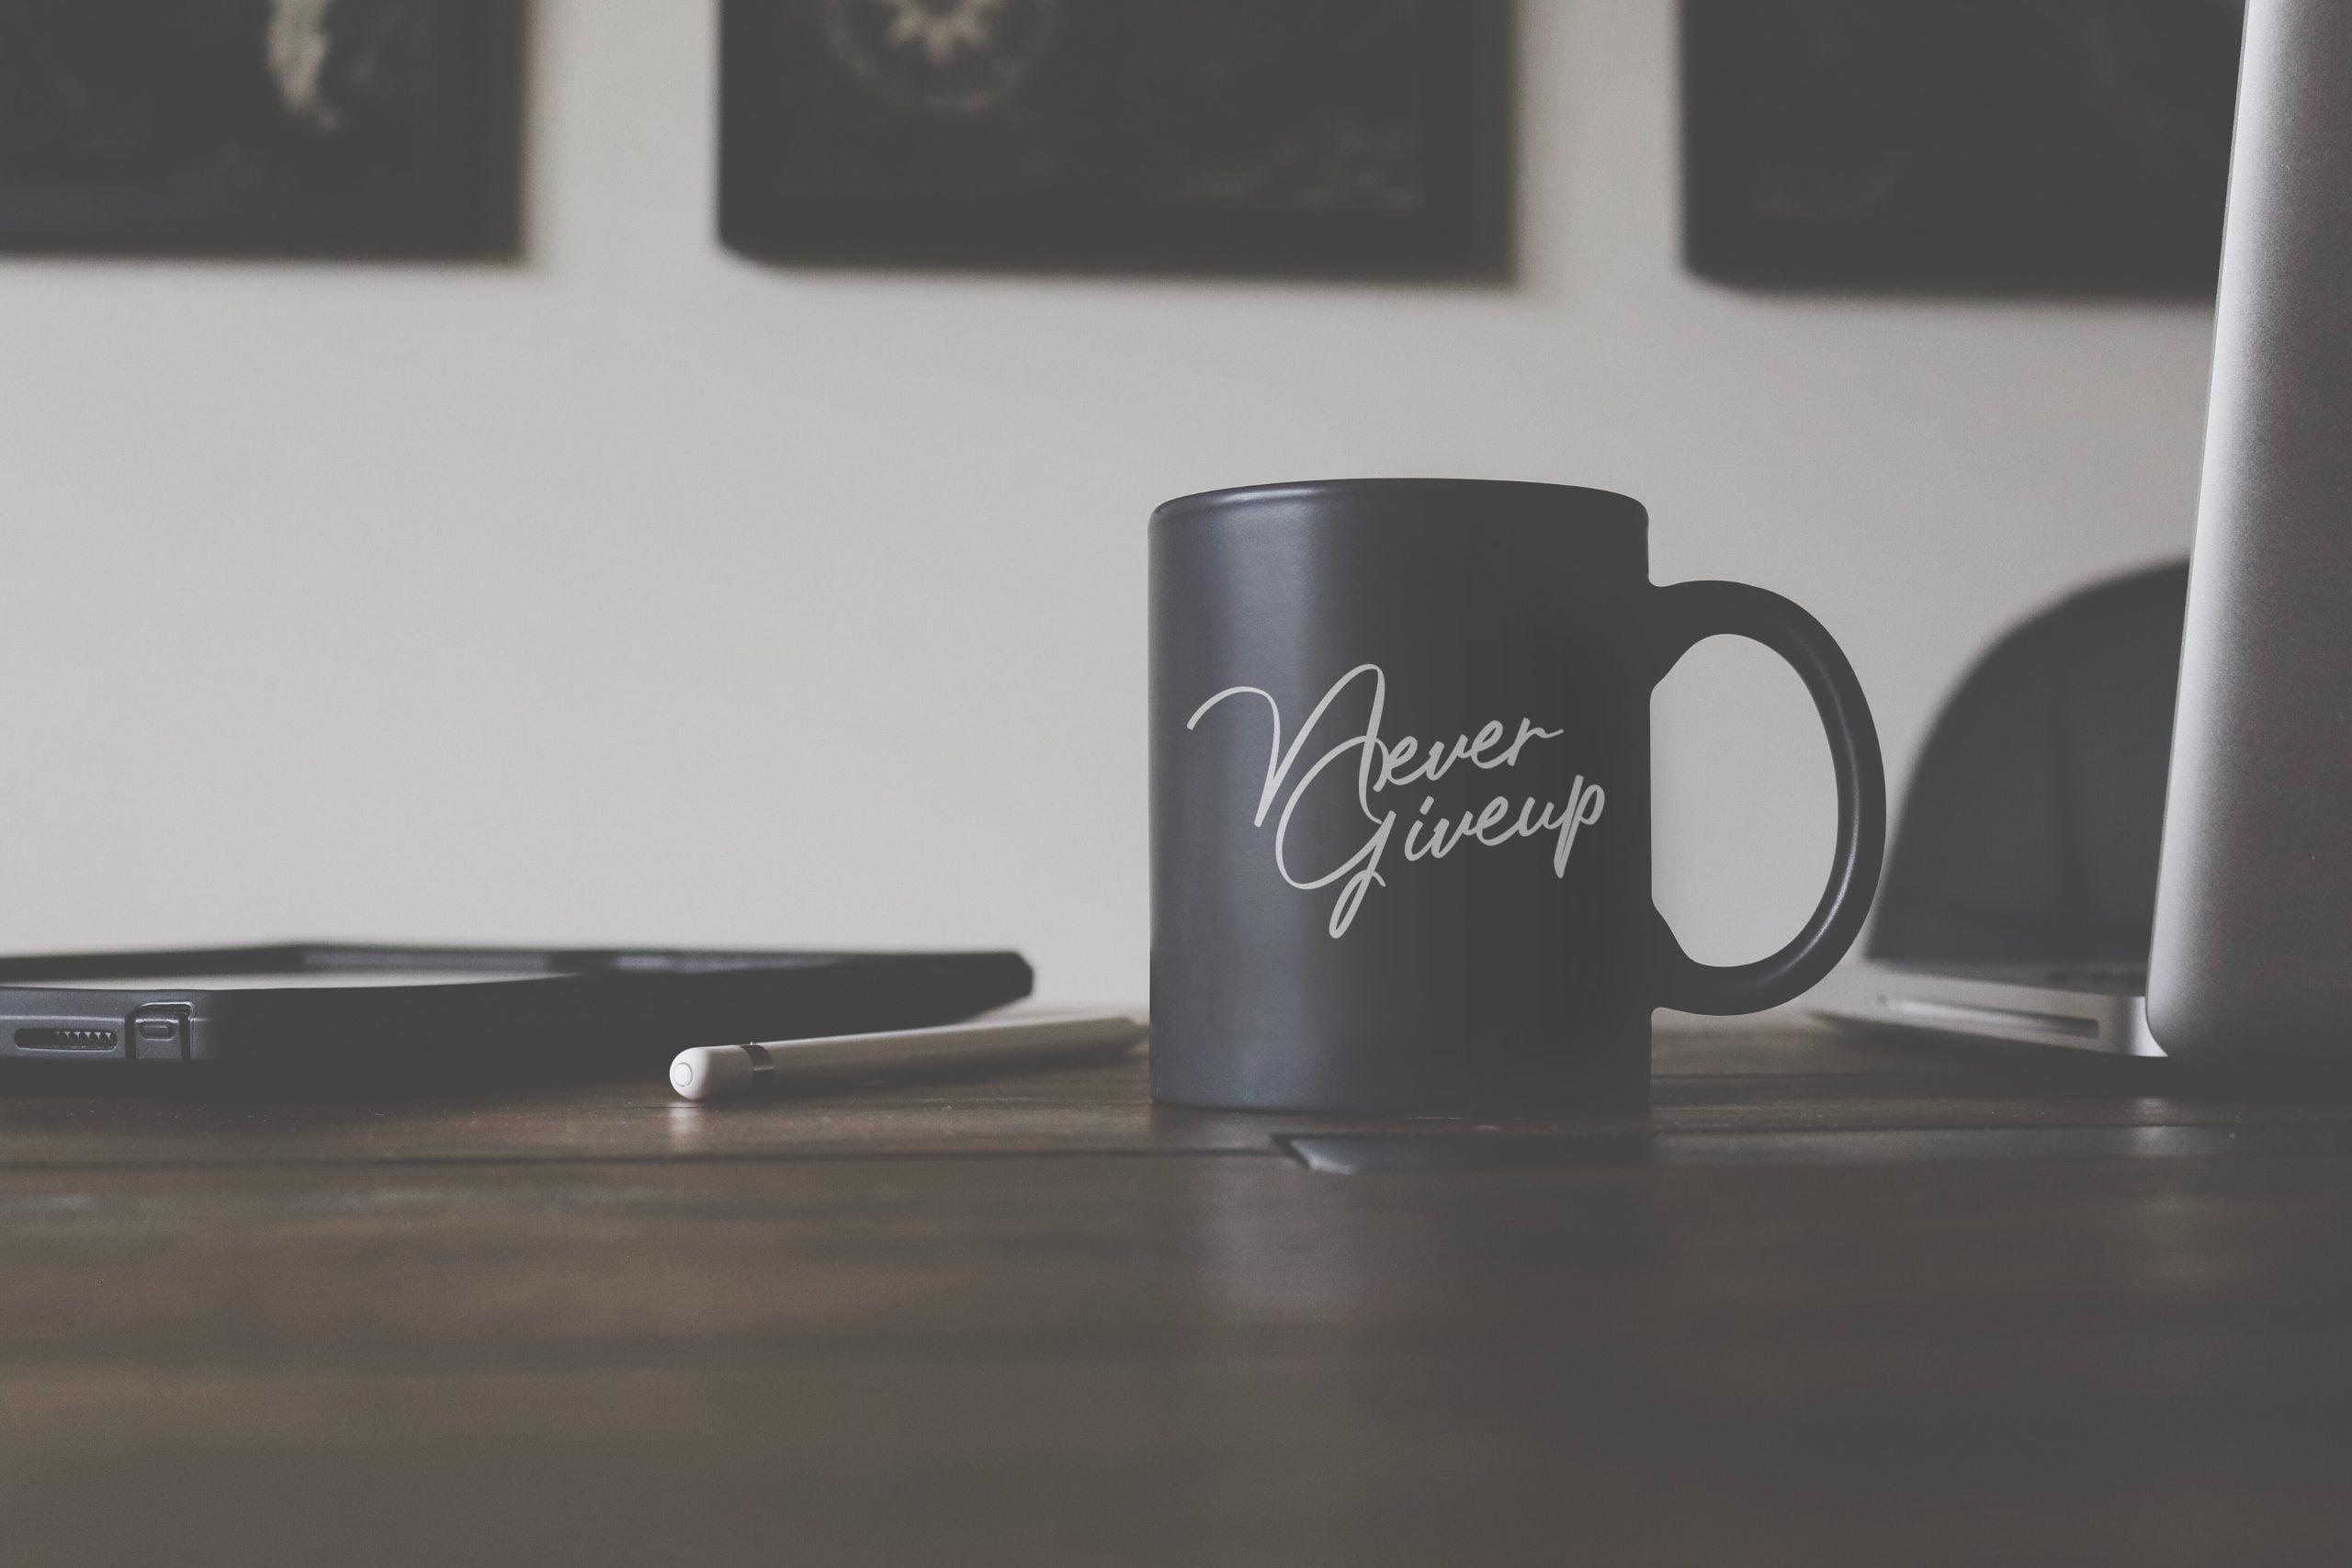 Black Matte Coffee Cup Mockup Download